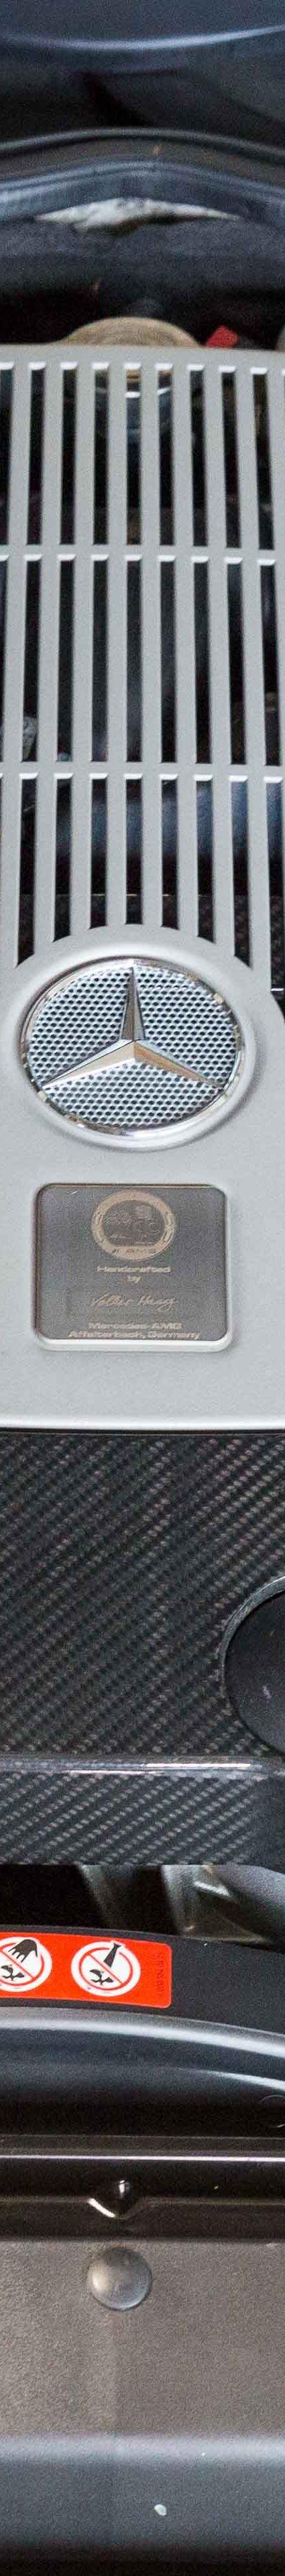 2005 MERCEDES SL65 AMG- for sale in Australia